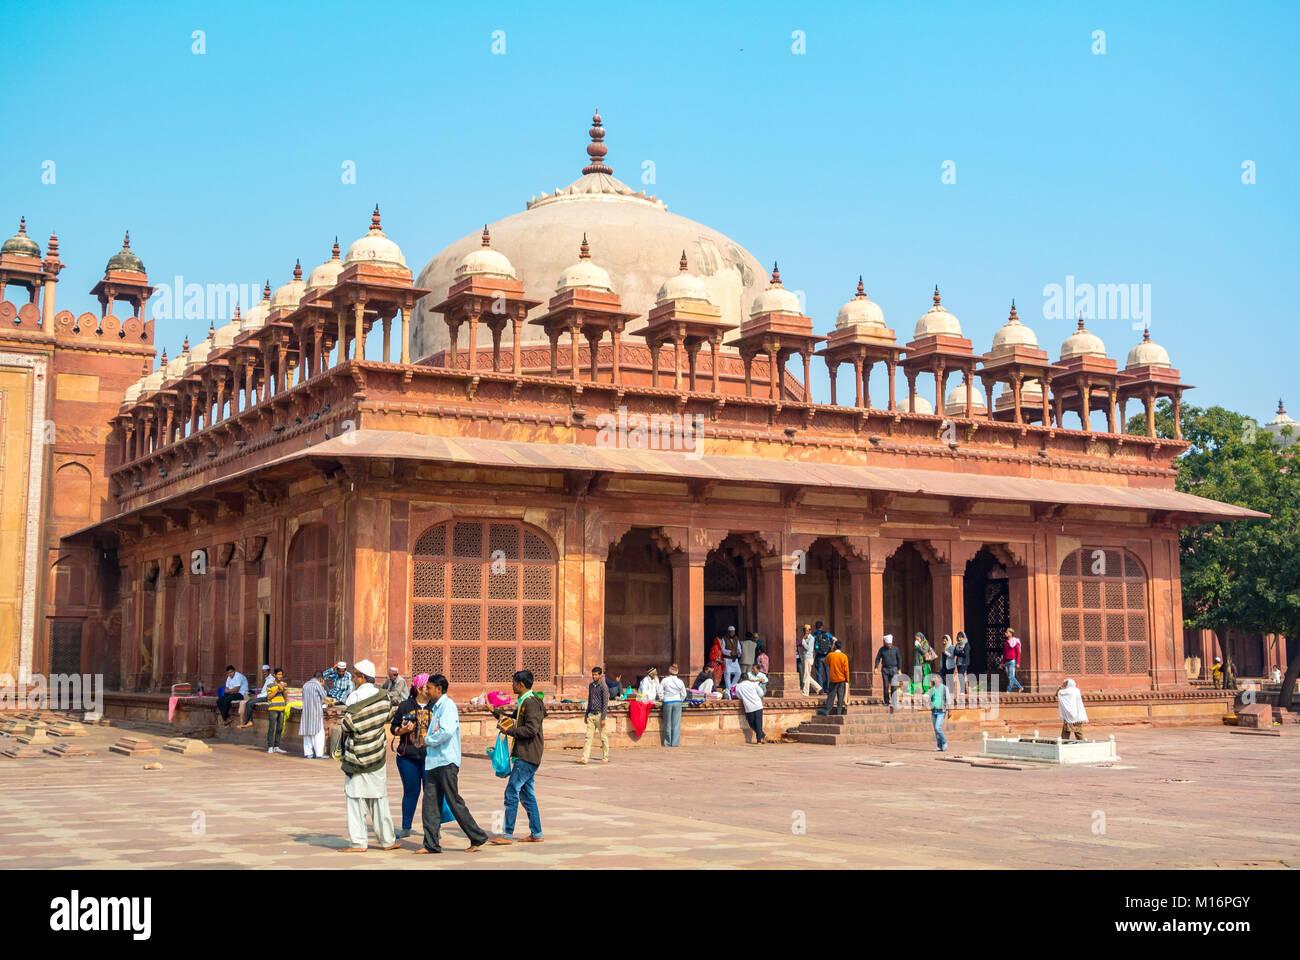 Fatehpur-Sikri, Uttar Pradesh, Inde - Stock Image